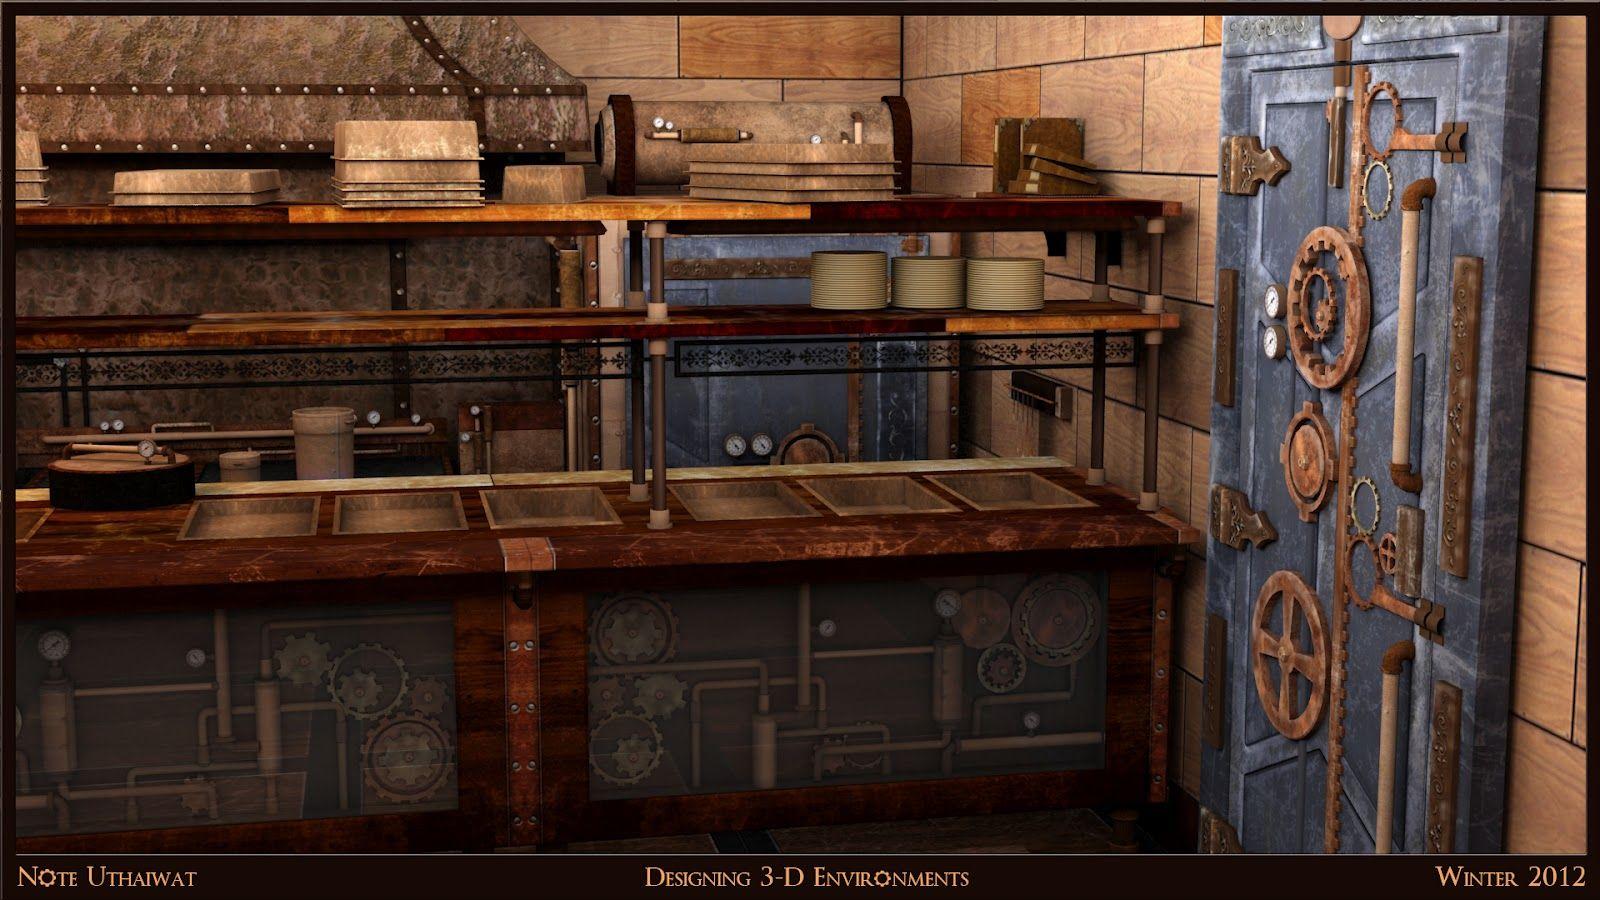 steampunk kitchen - Google Search